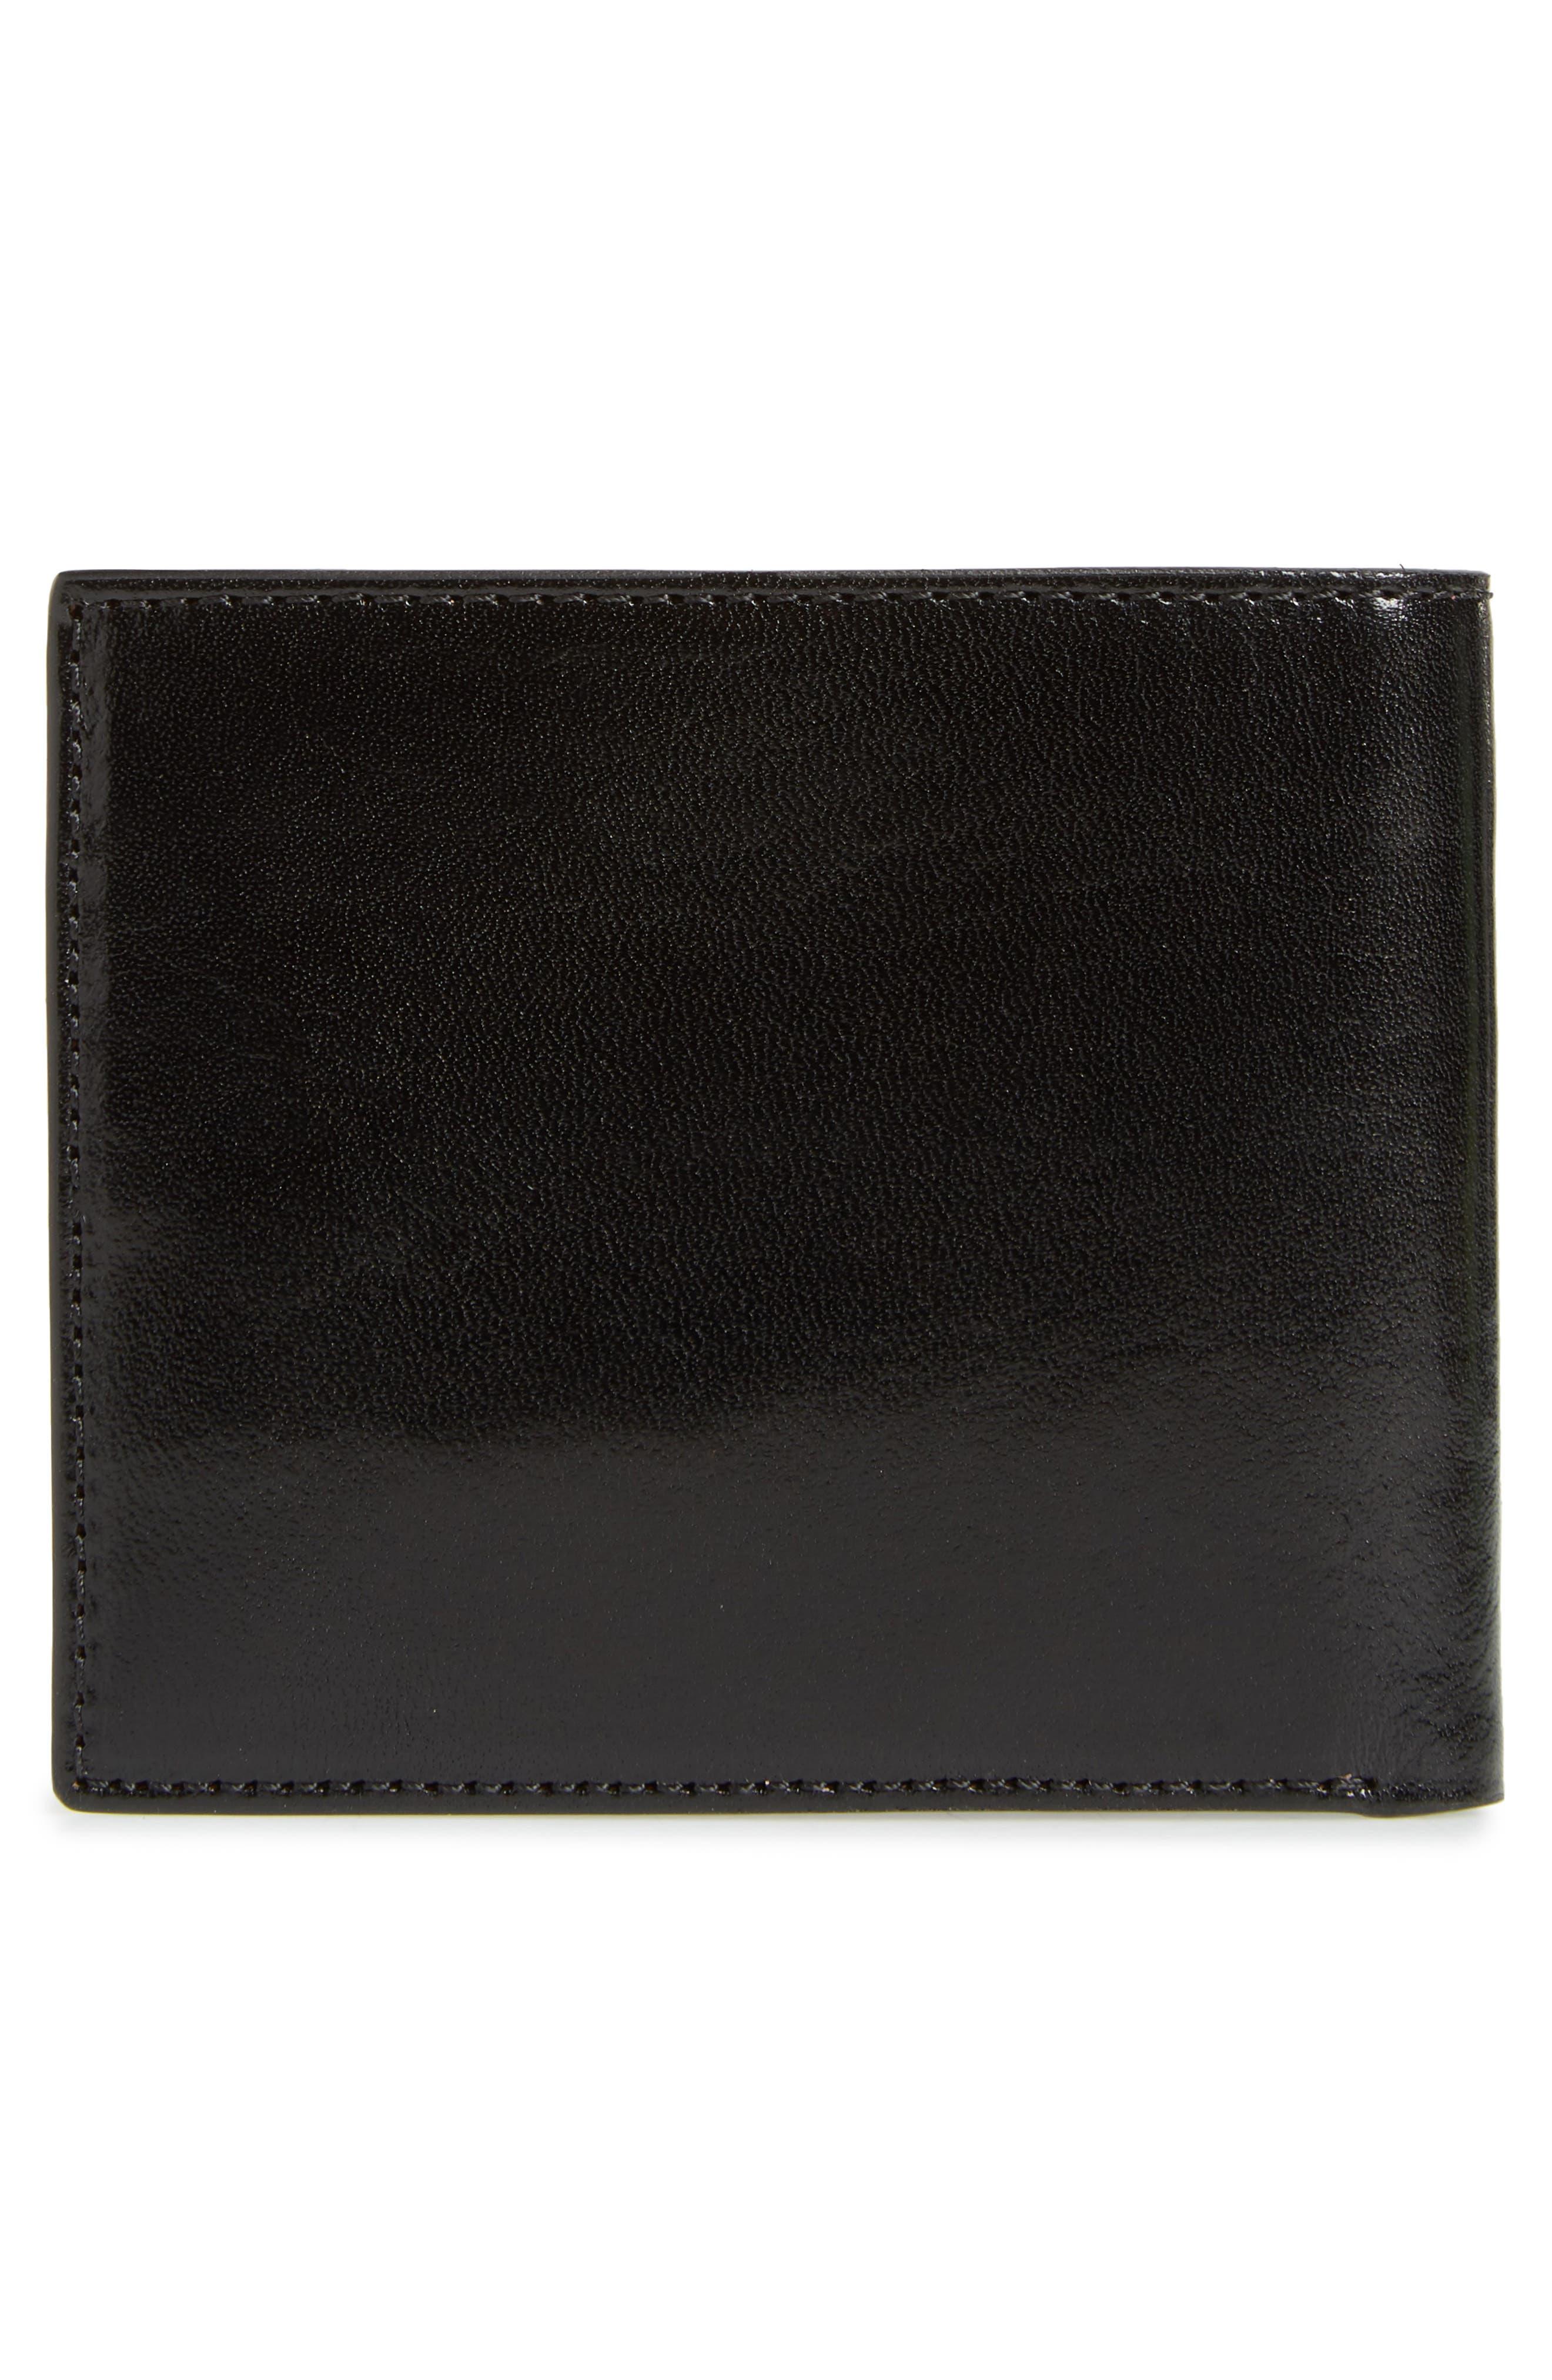 TED BAKER LONDON, Contrast Leather Wallet, Alternate thumbnail 3, color, BLACK